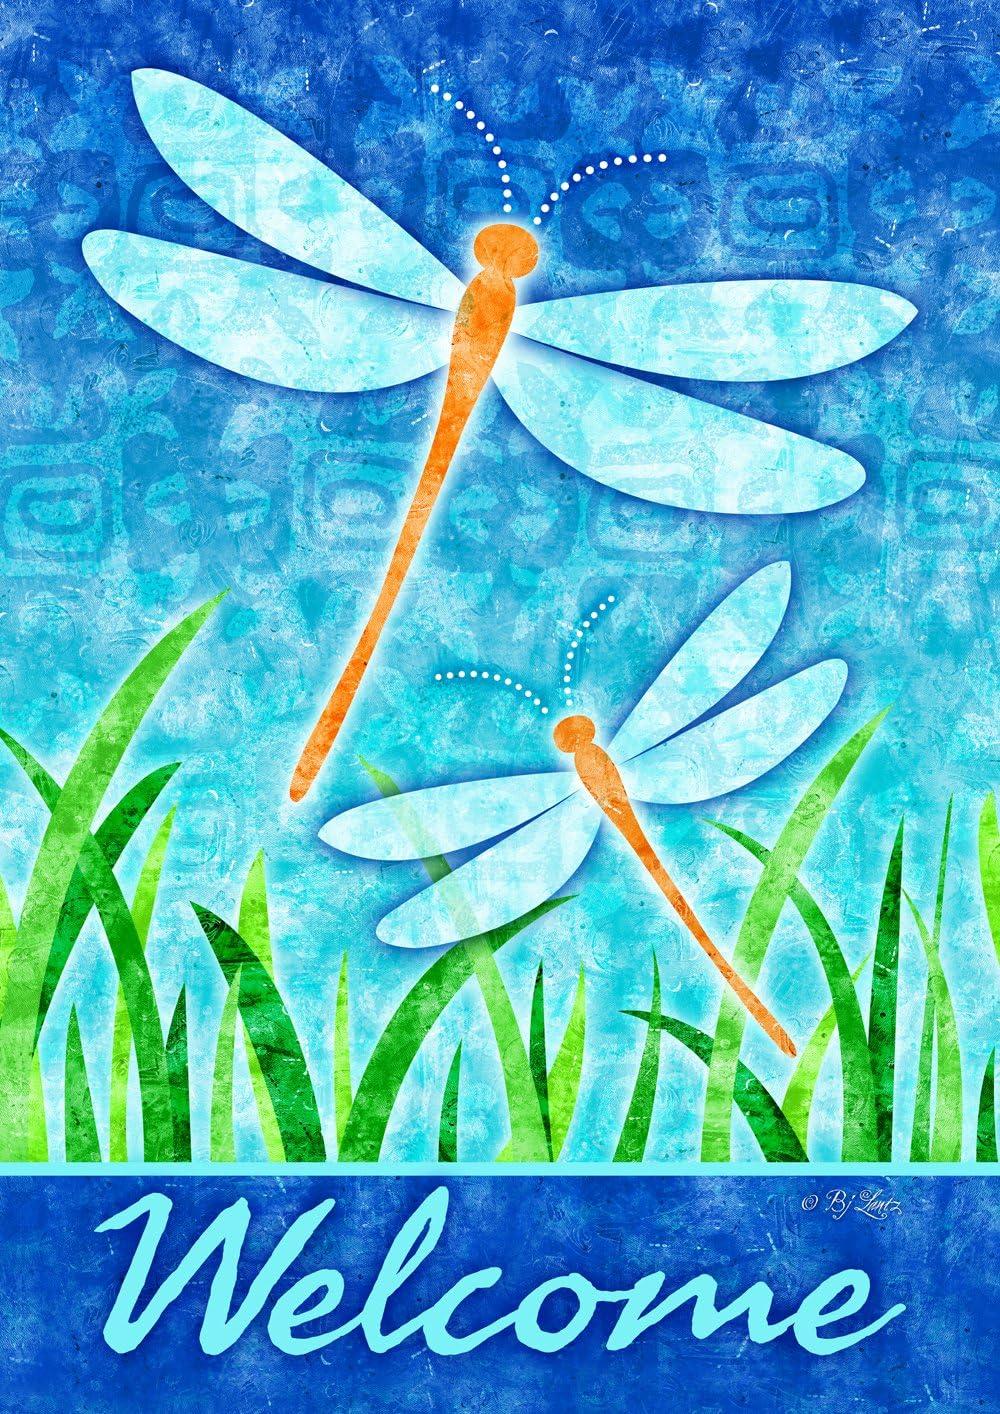 Toland Home Garden 1112097 Dragonflies and Reeds (12.5 x 18-Inch), Garden Flag (12.5